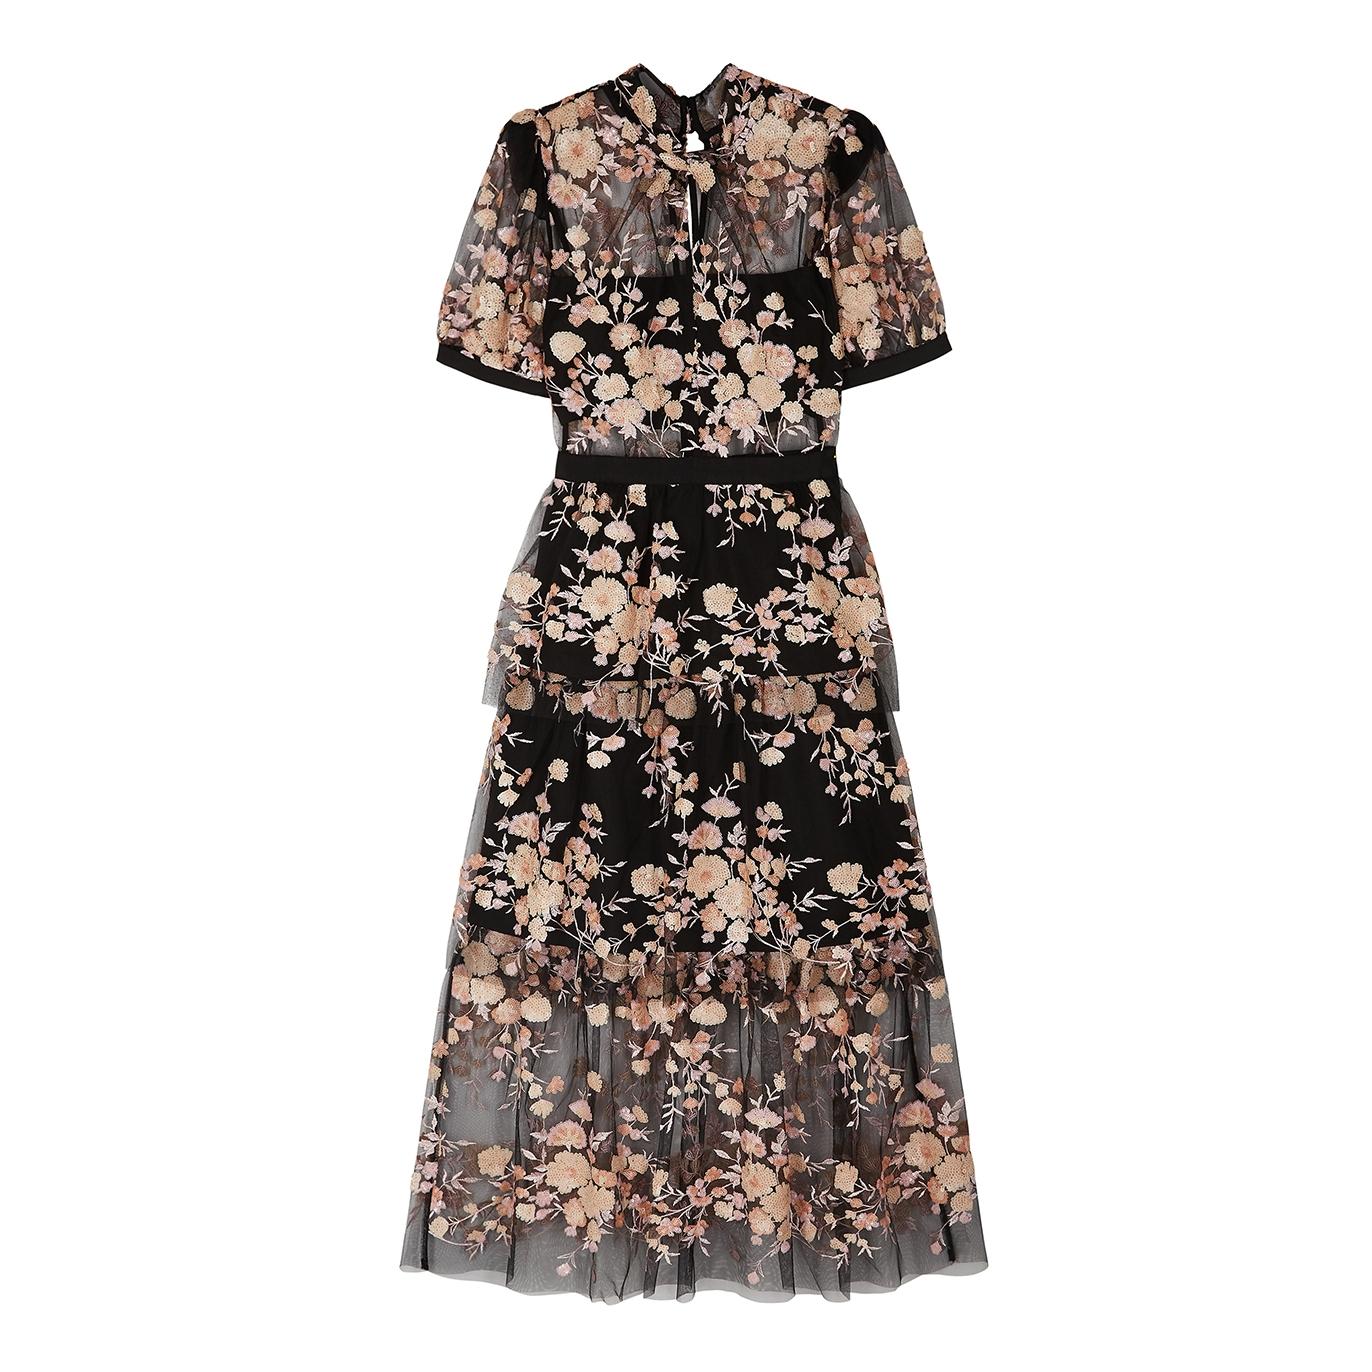 58c0ec274d1f Self-Portrait Black floral-embellished tulle midi dress - Harvey Nichols